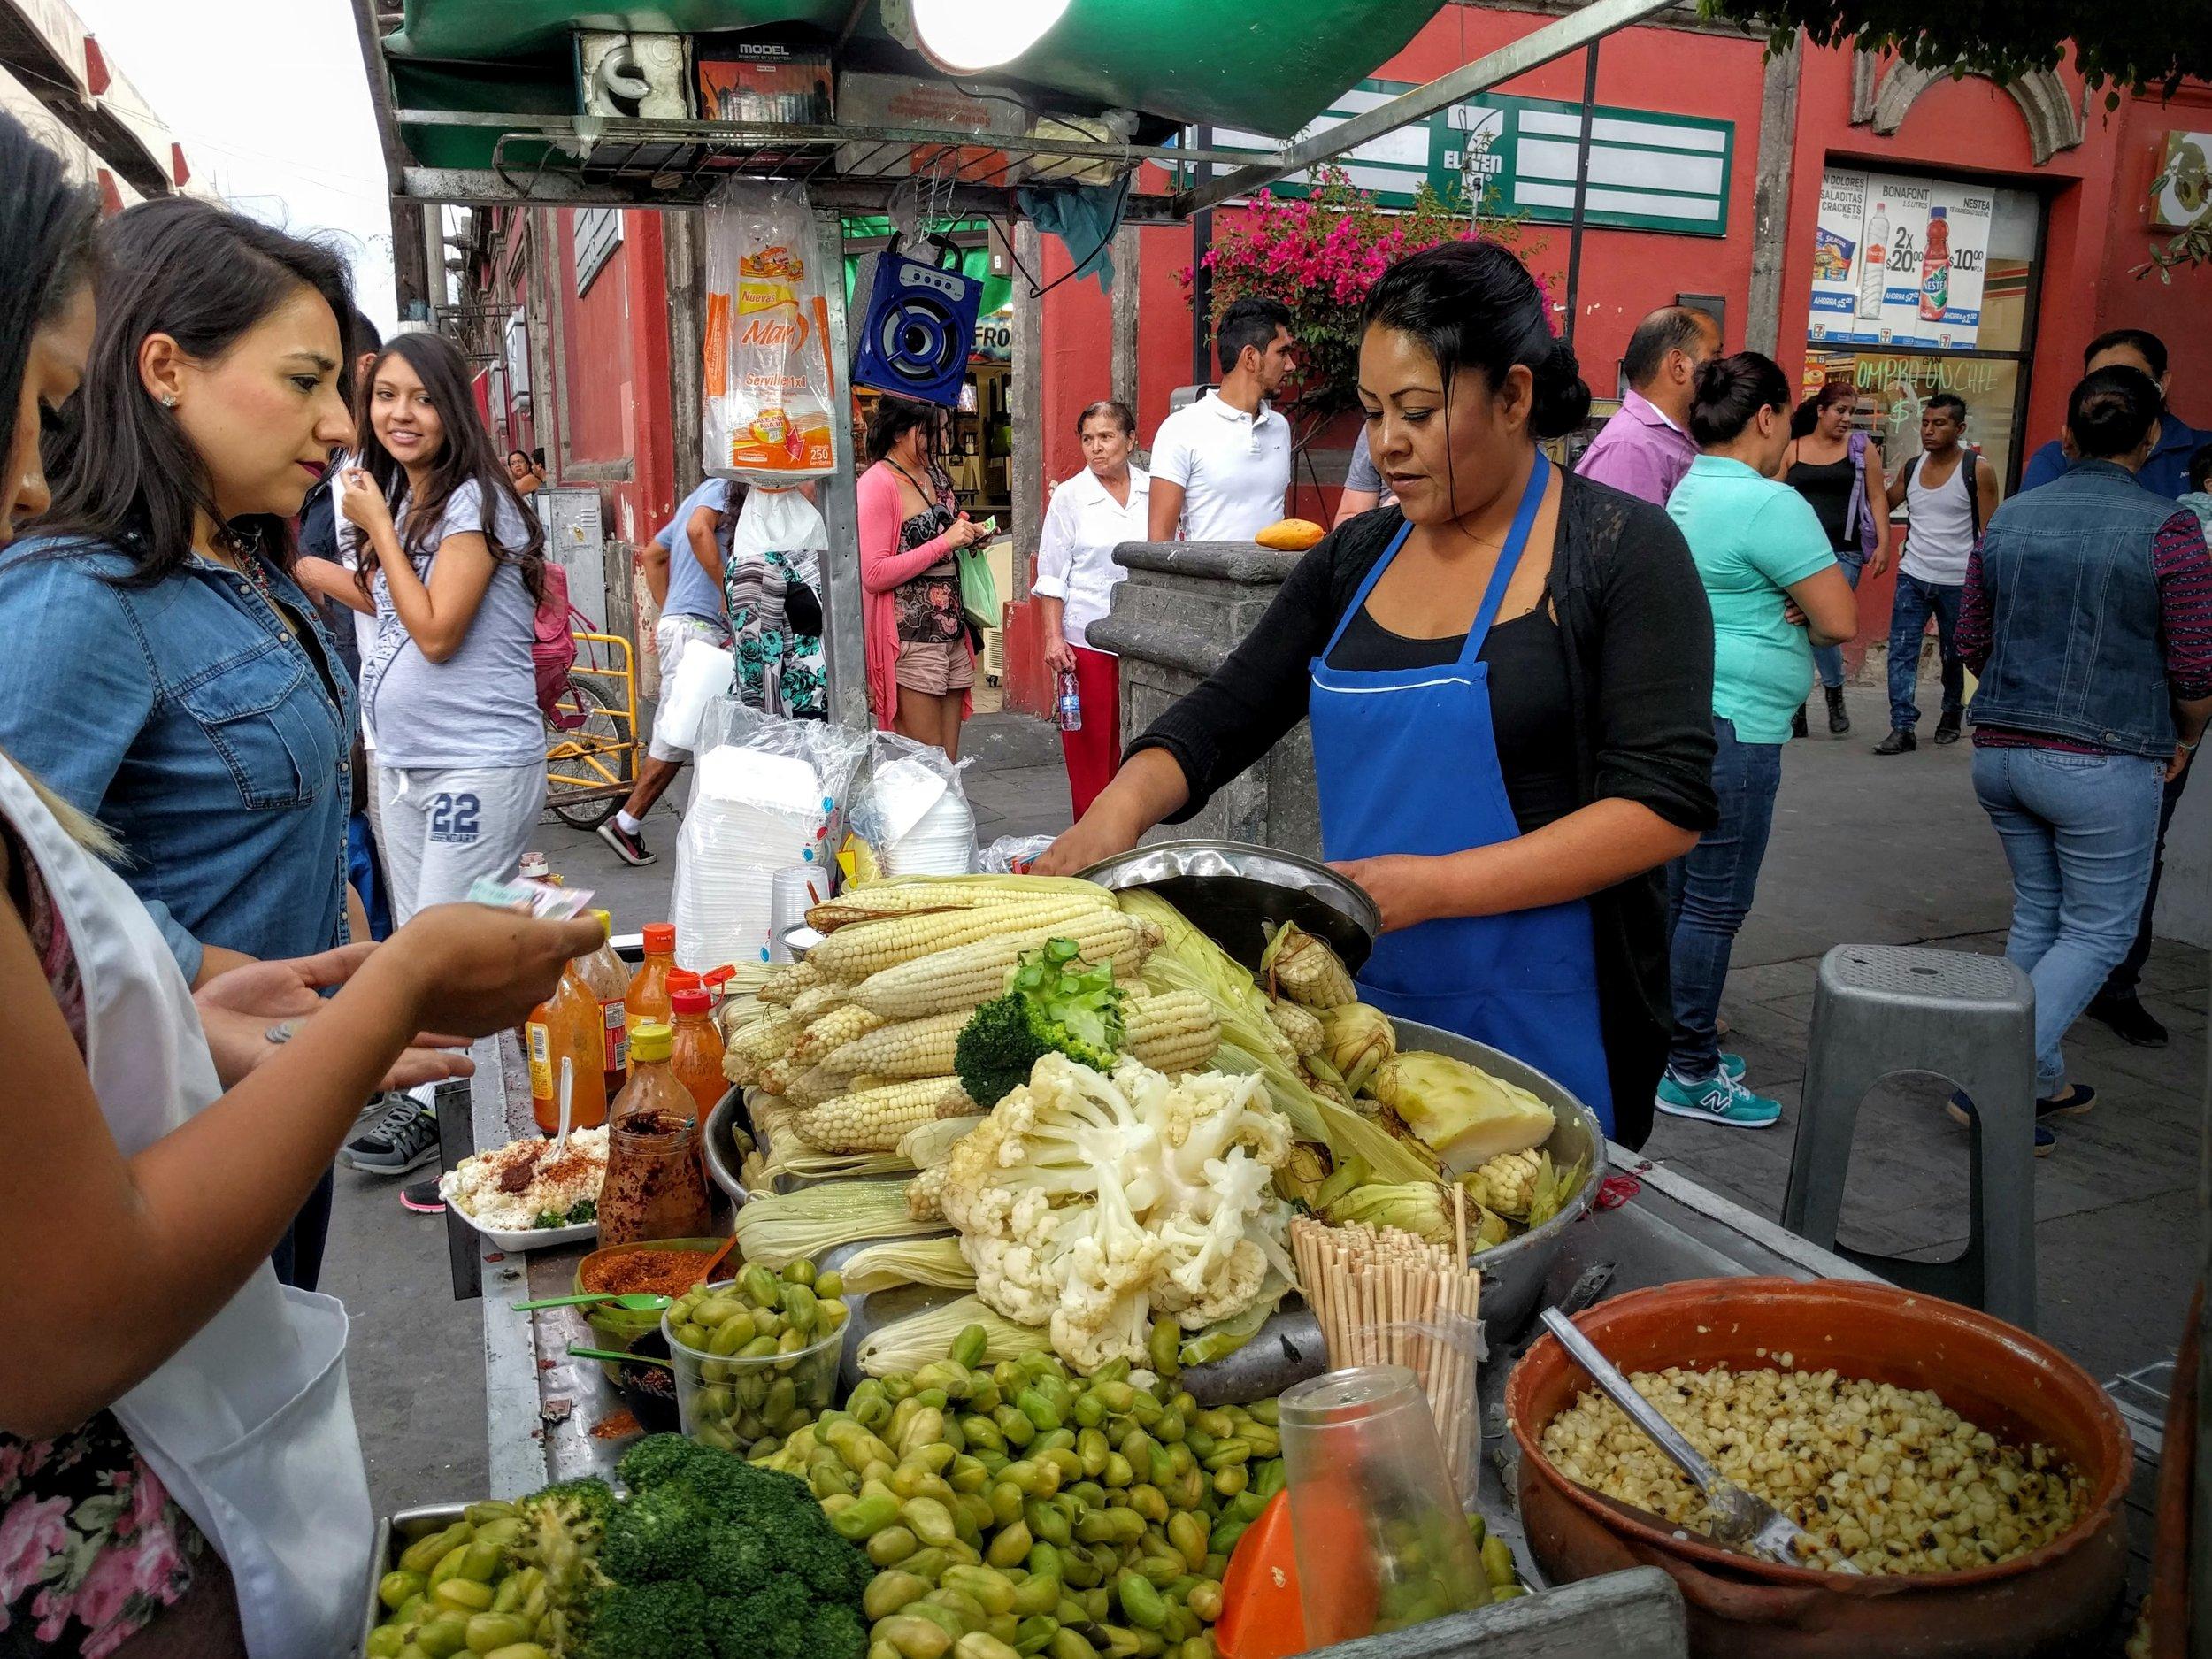 Street Veggies - Tlaquepaque, Mexico